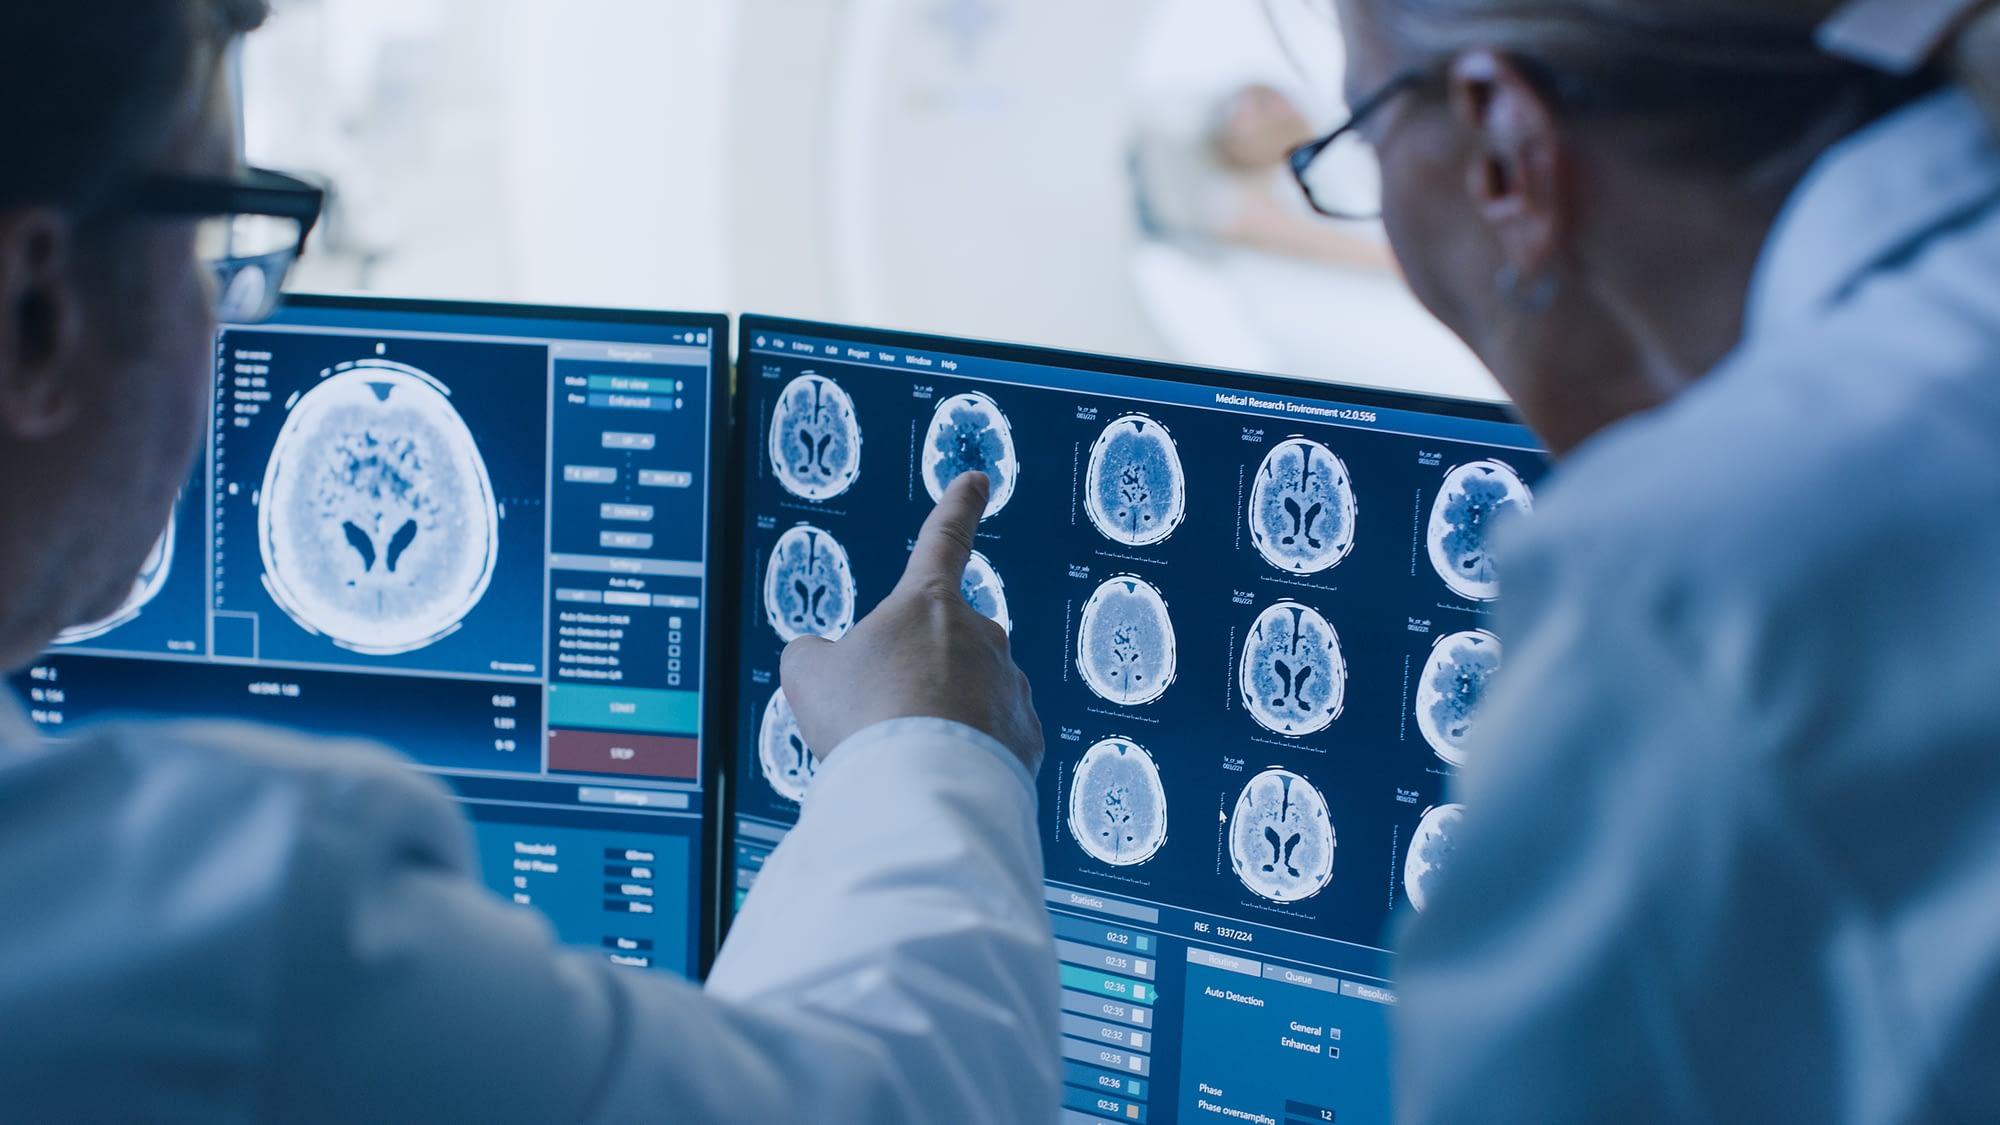 Doctors examining brain images